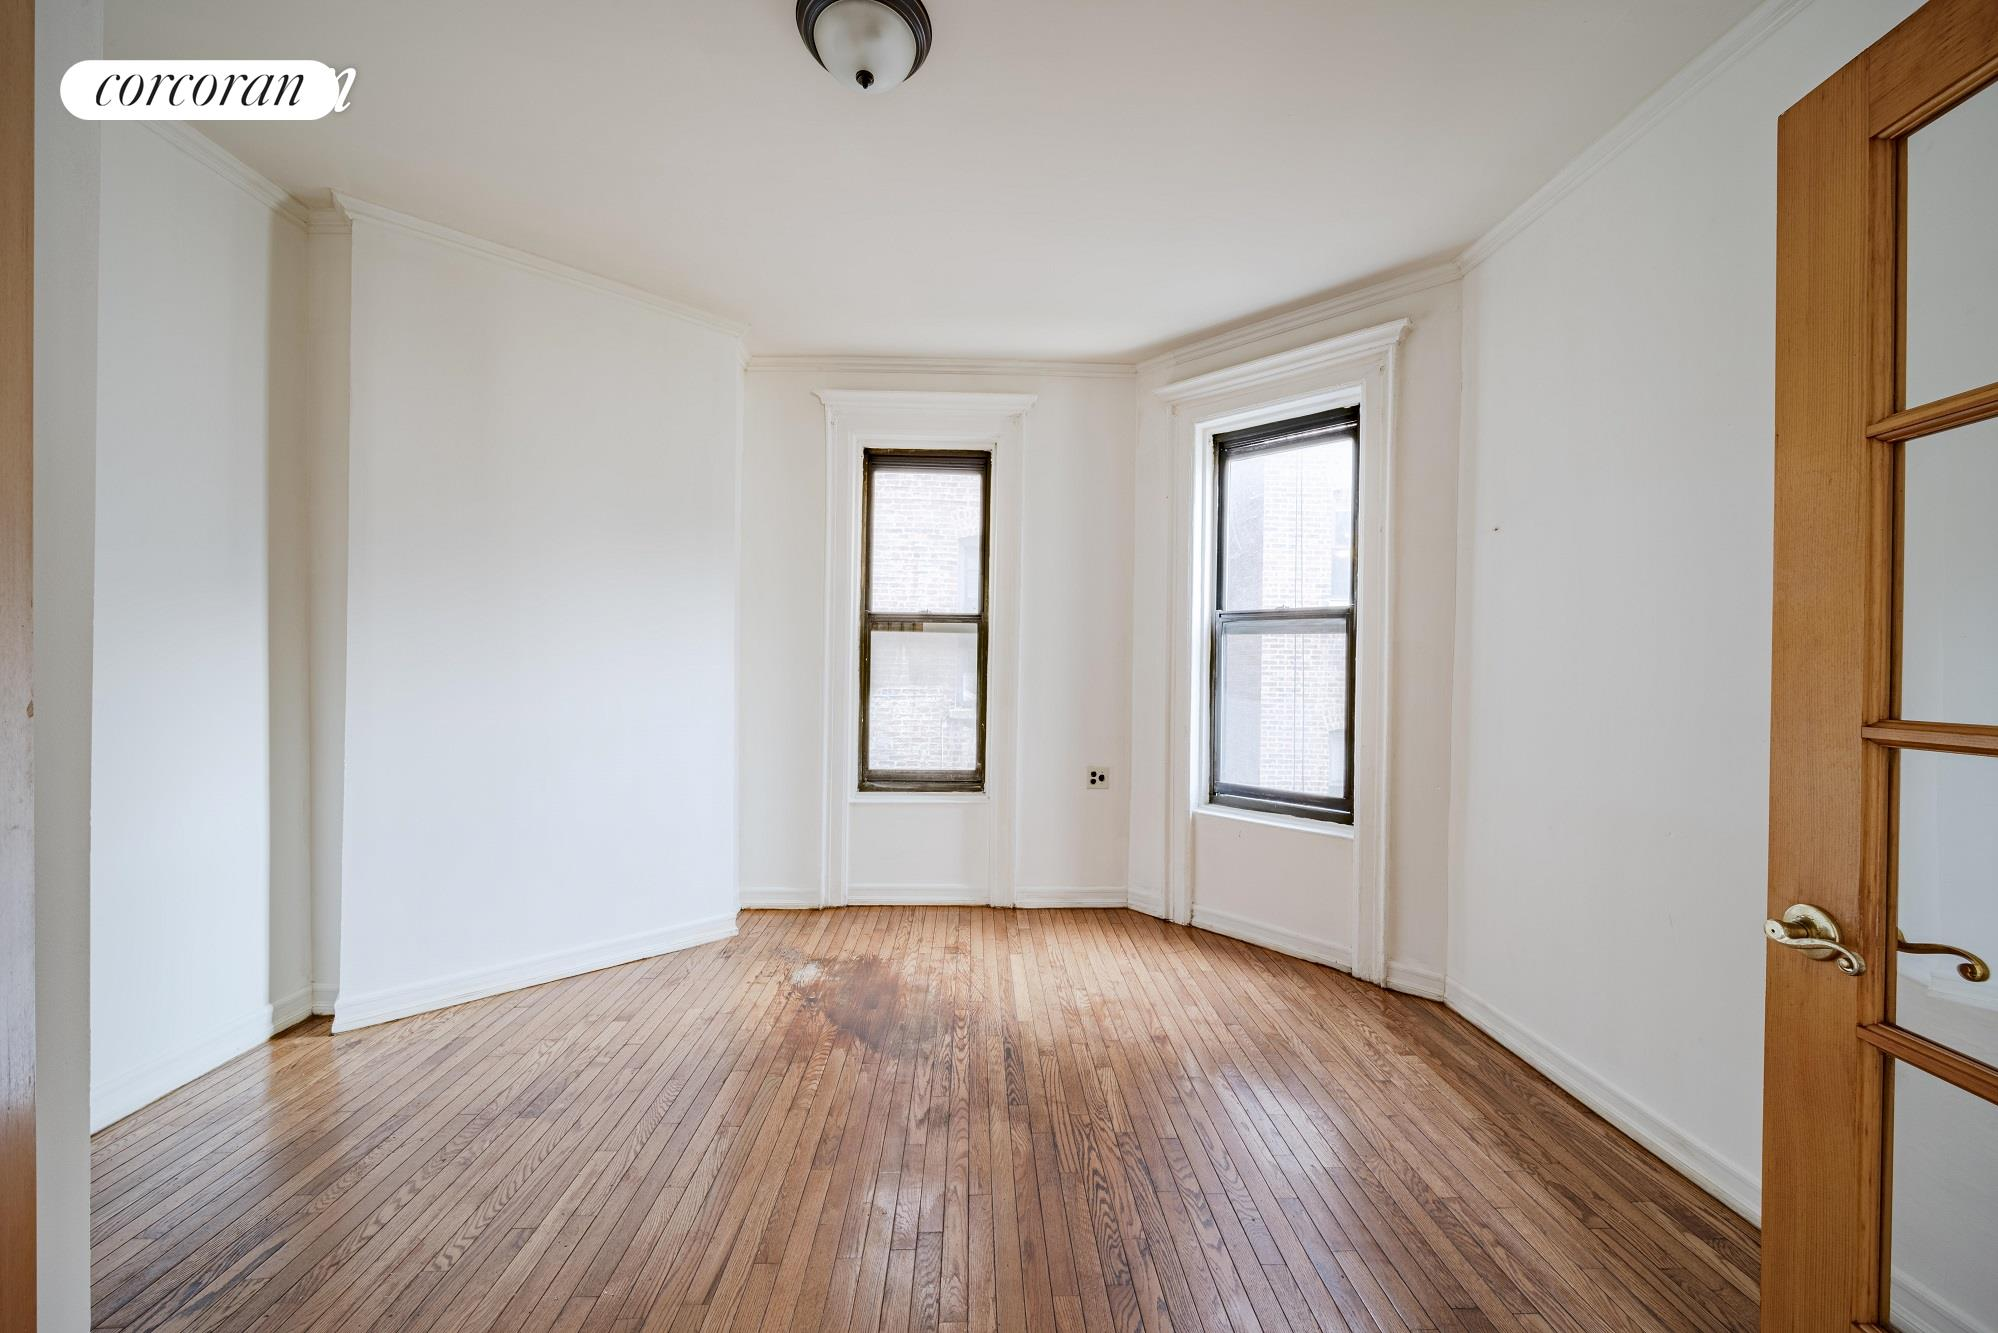 1878 Adam Clayton Powell Blvd. West Harlem New York NY 10026